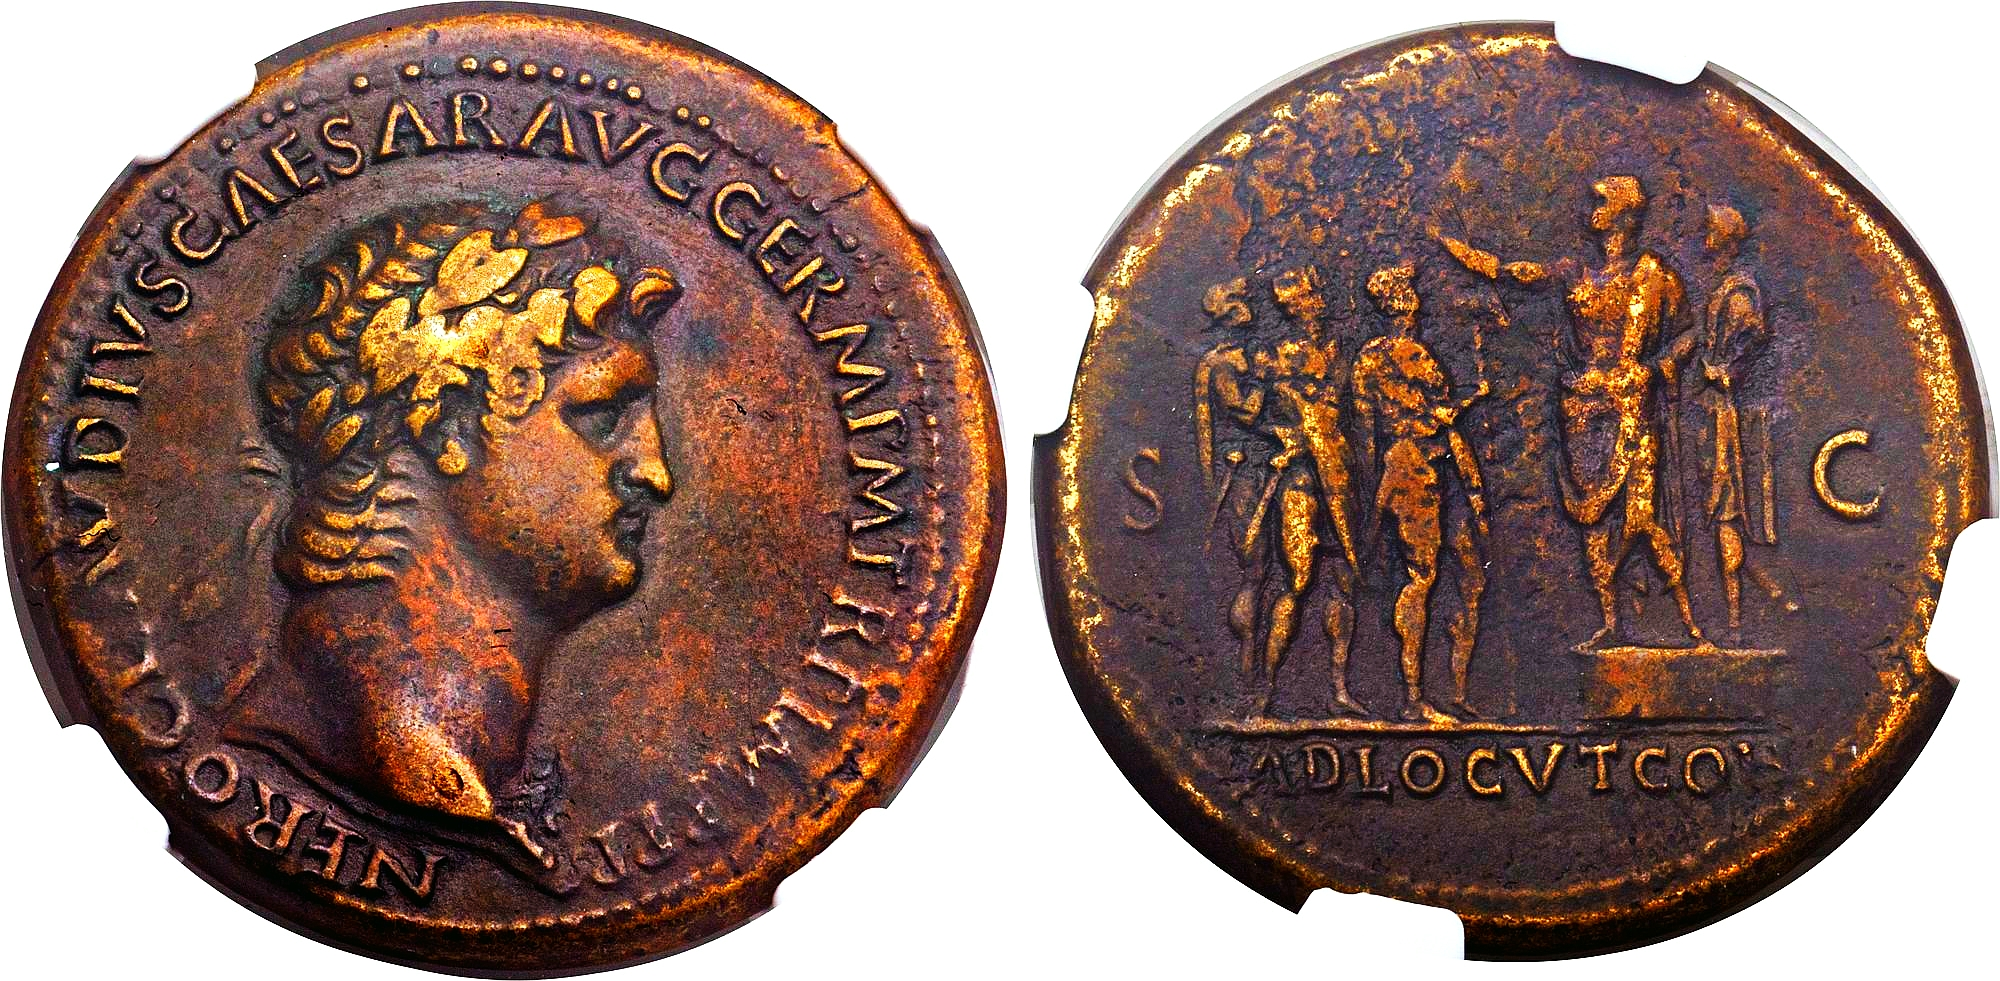 Moneda romana de oricalco.